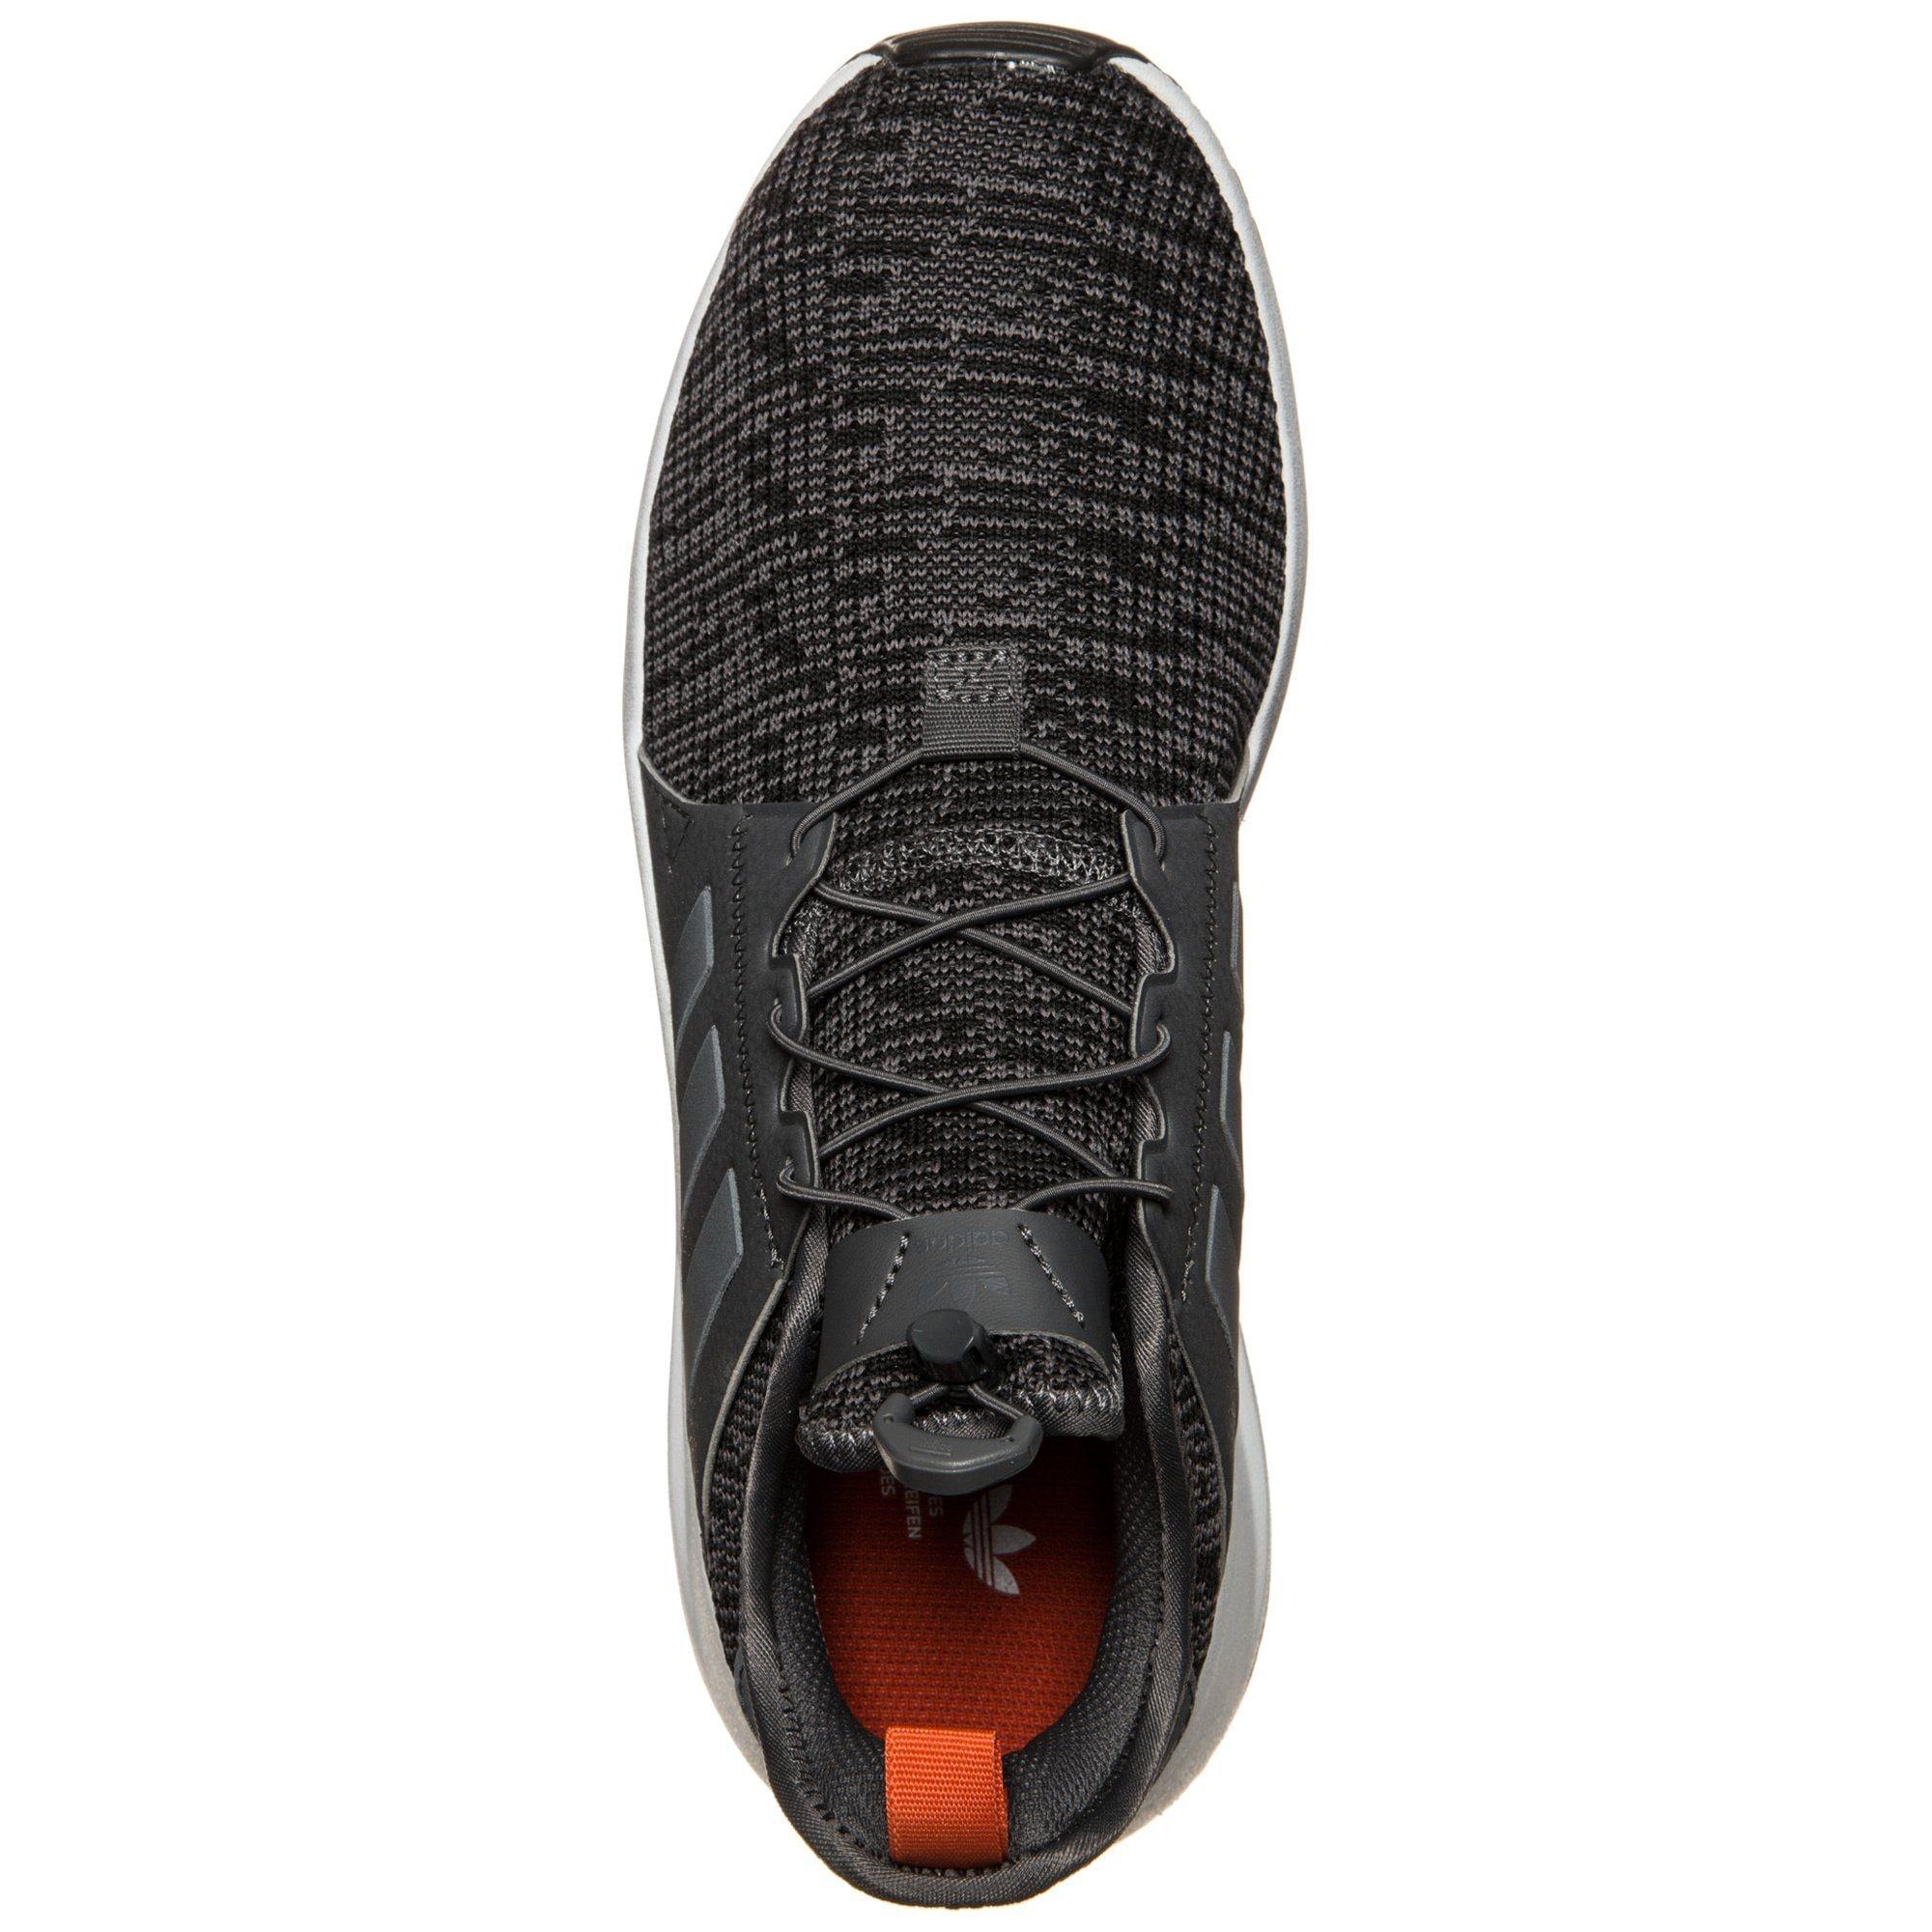 7f888fe7e71f40 online online Adidas Sneaker kaufen »X Originals plr« Adidas bequem pqZx6qg